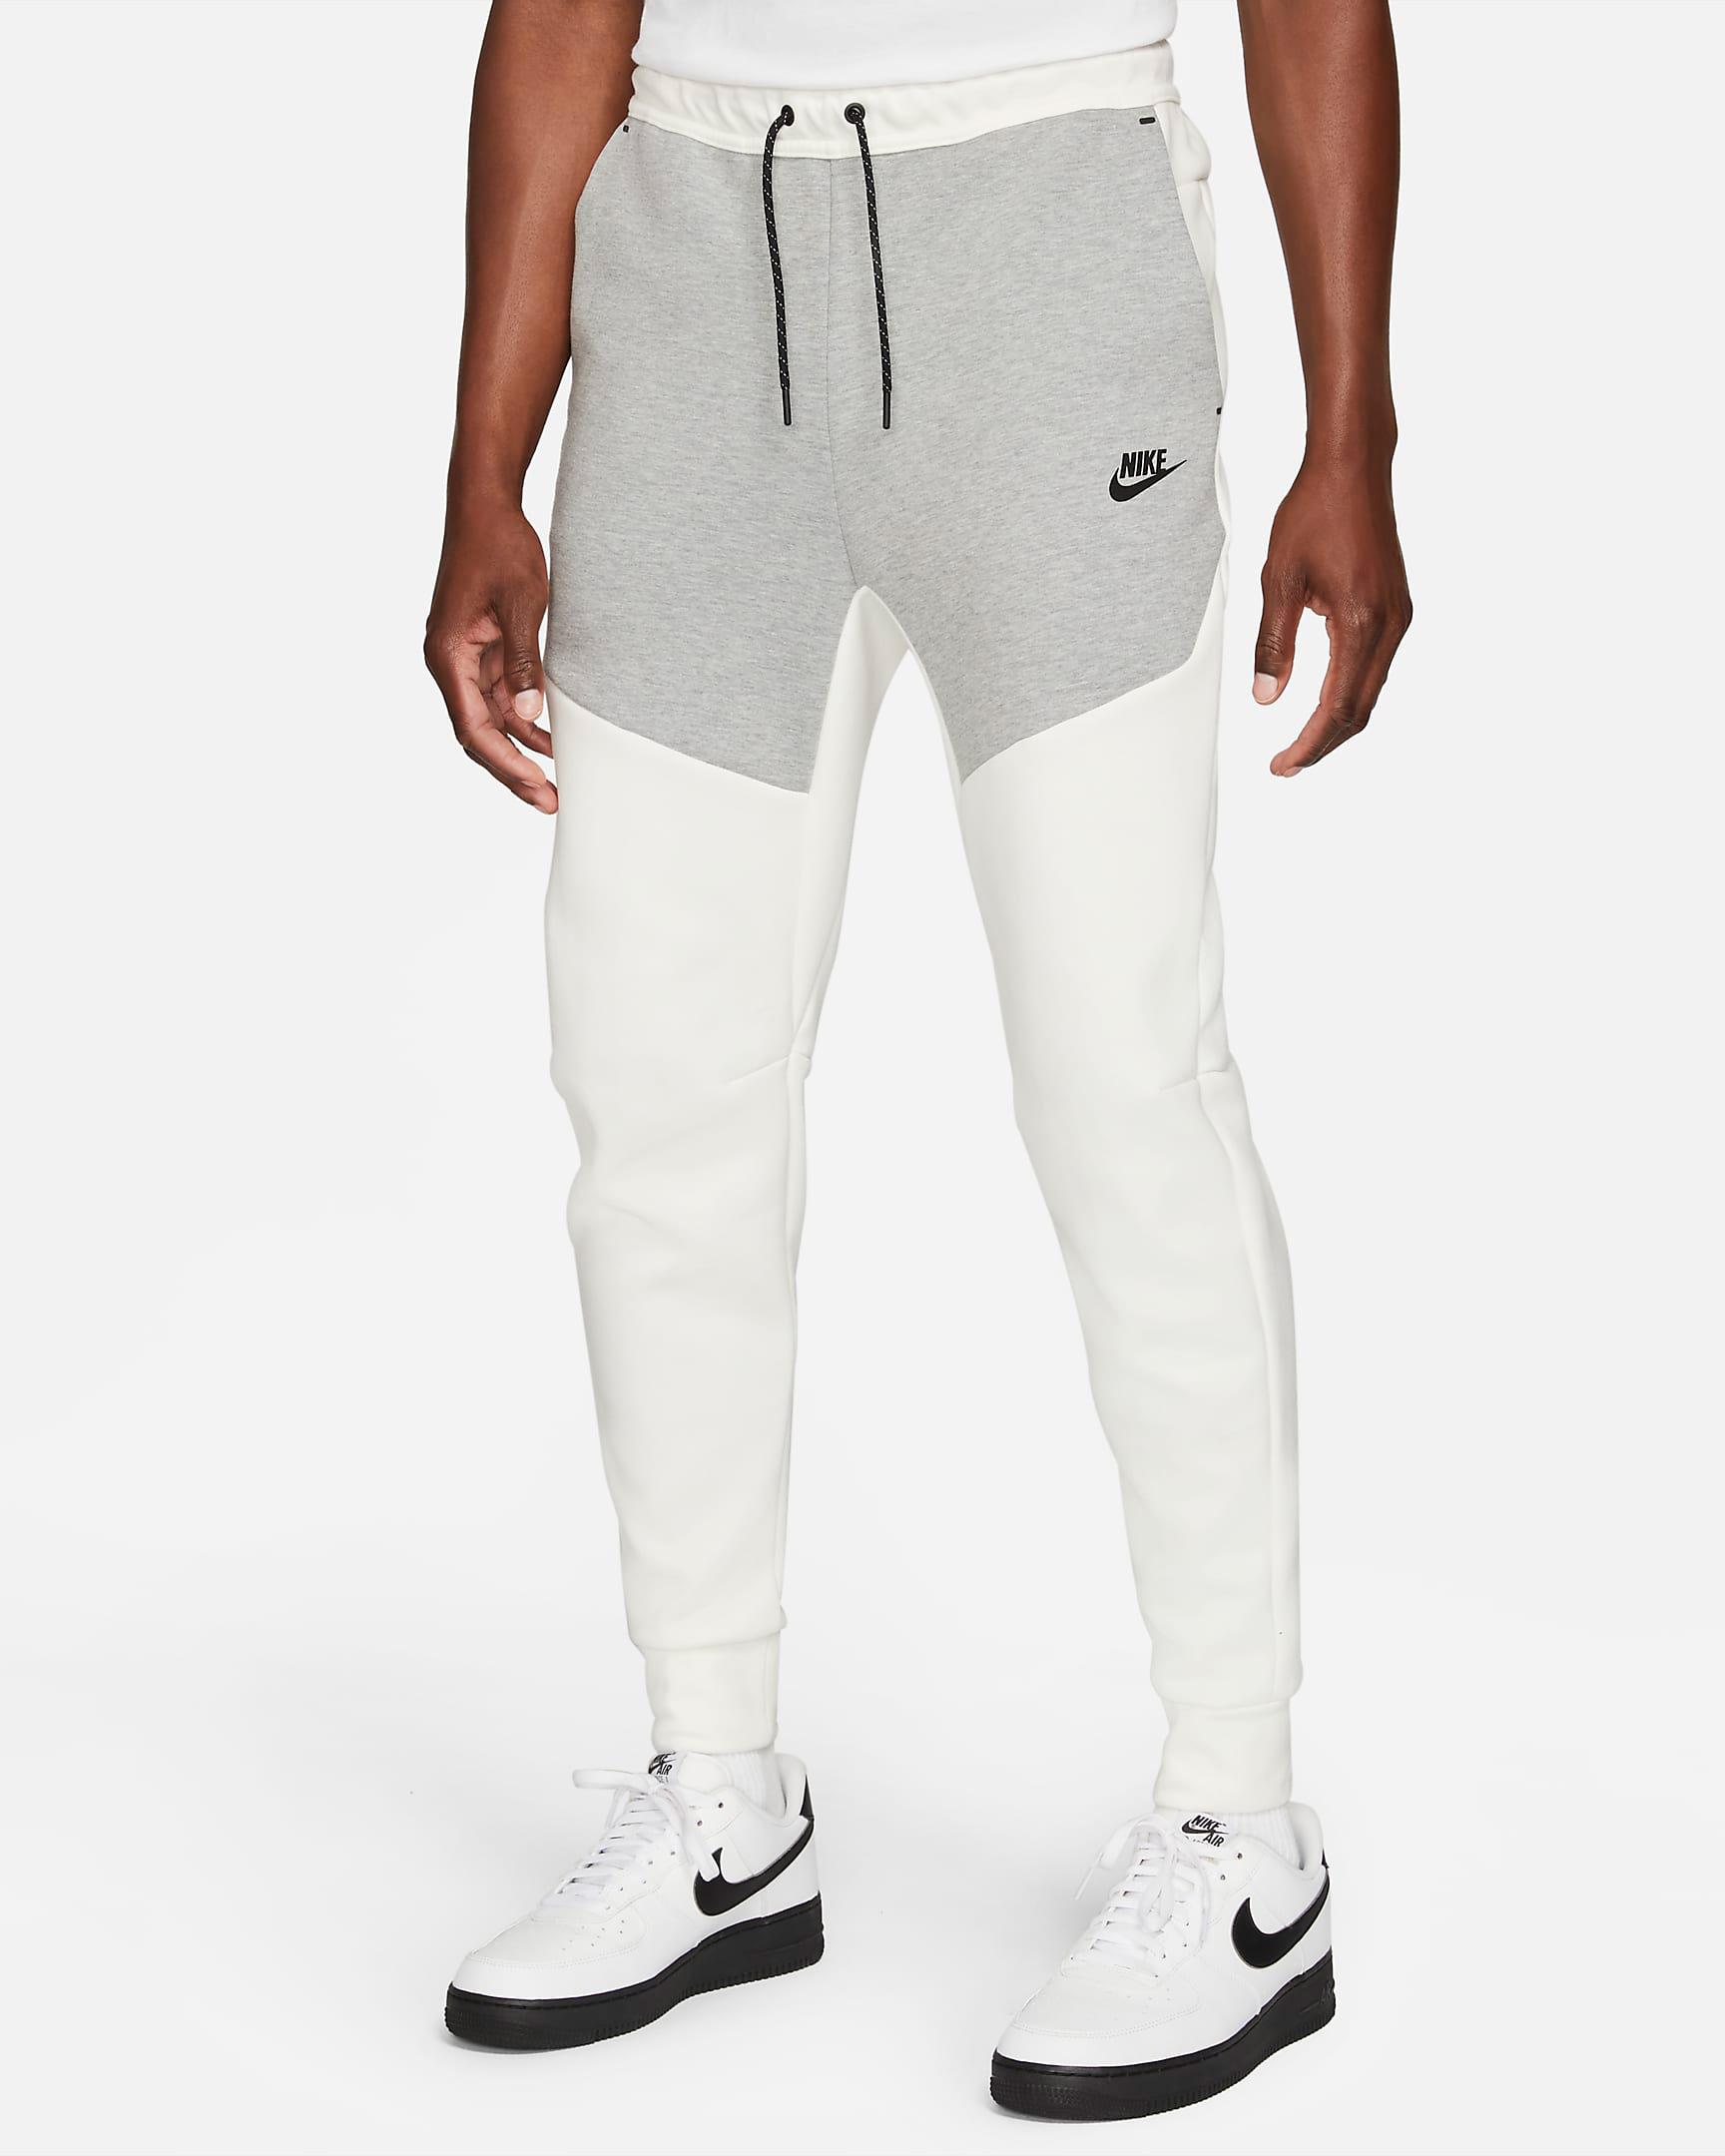 nike-tech-fleece-joggers-sail-dark-grey-1